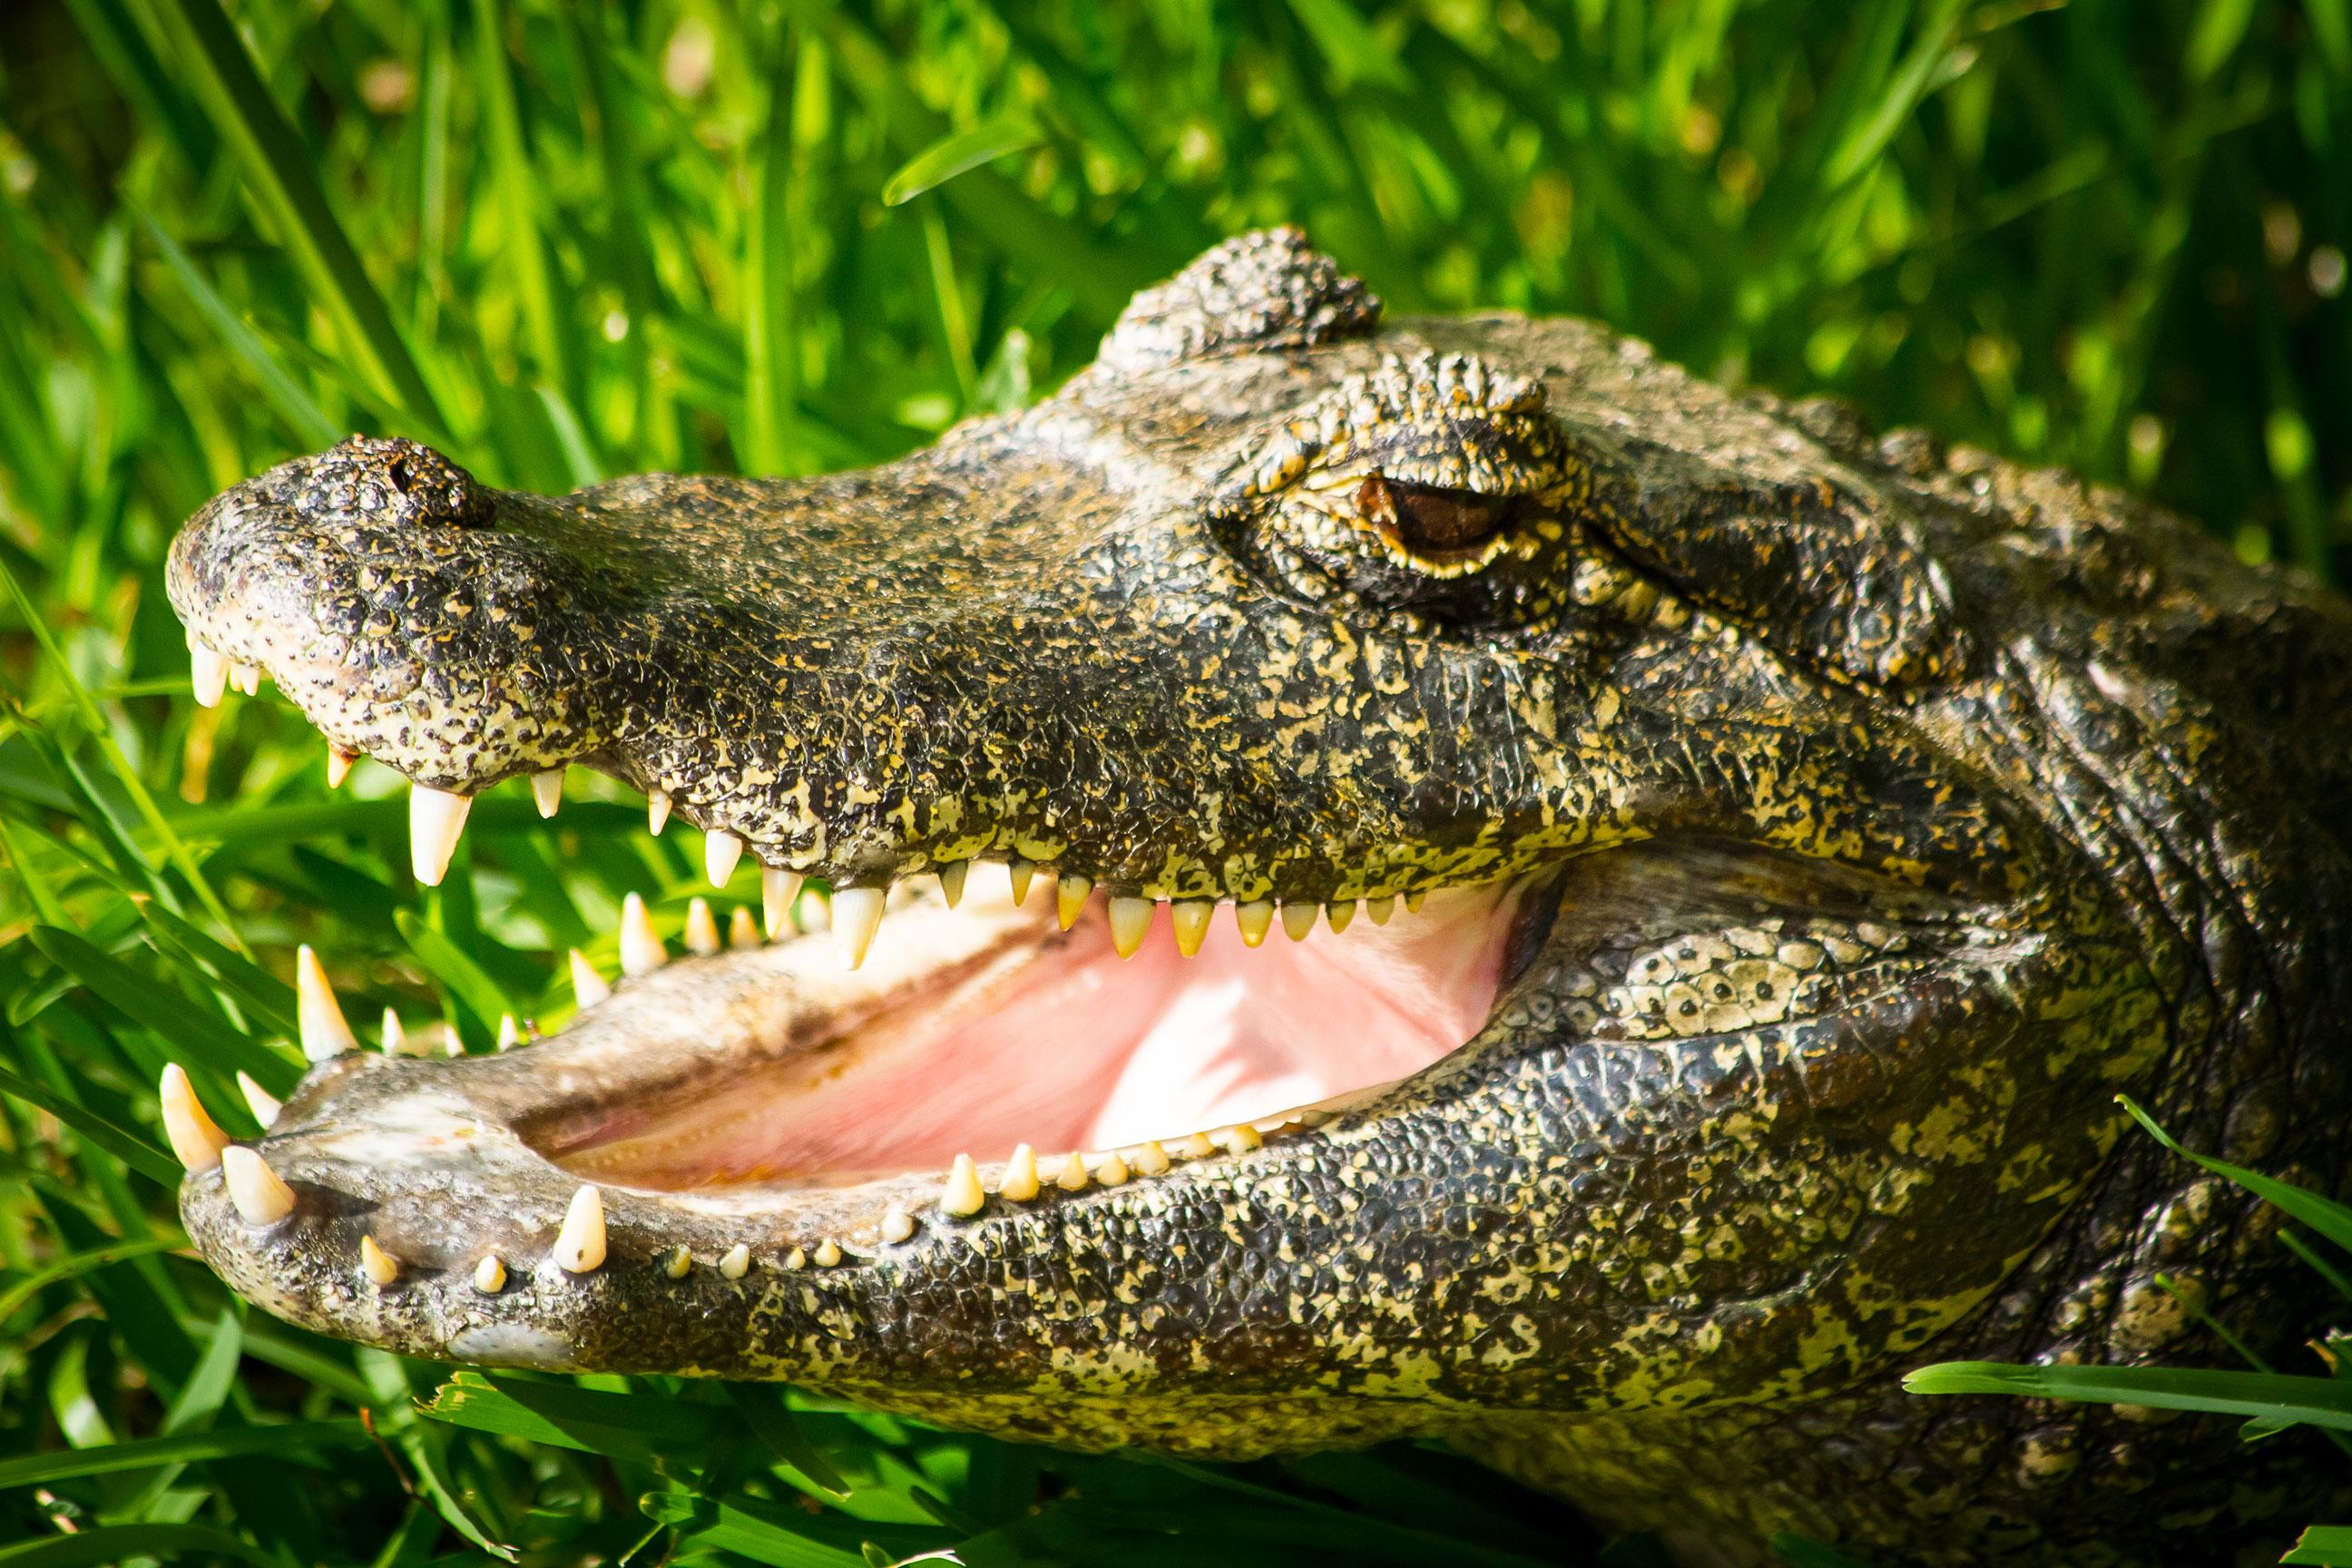 Yacare (Caiman) | Animals